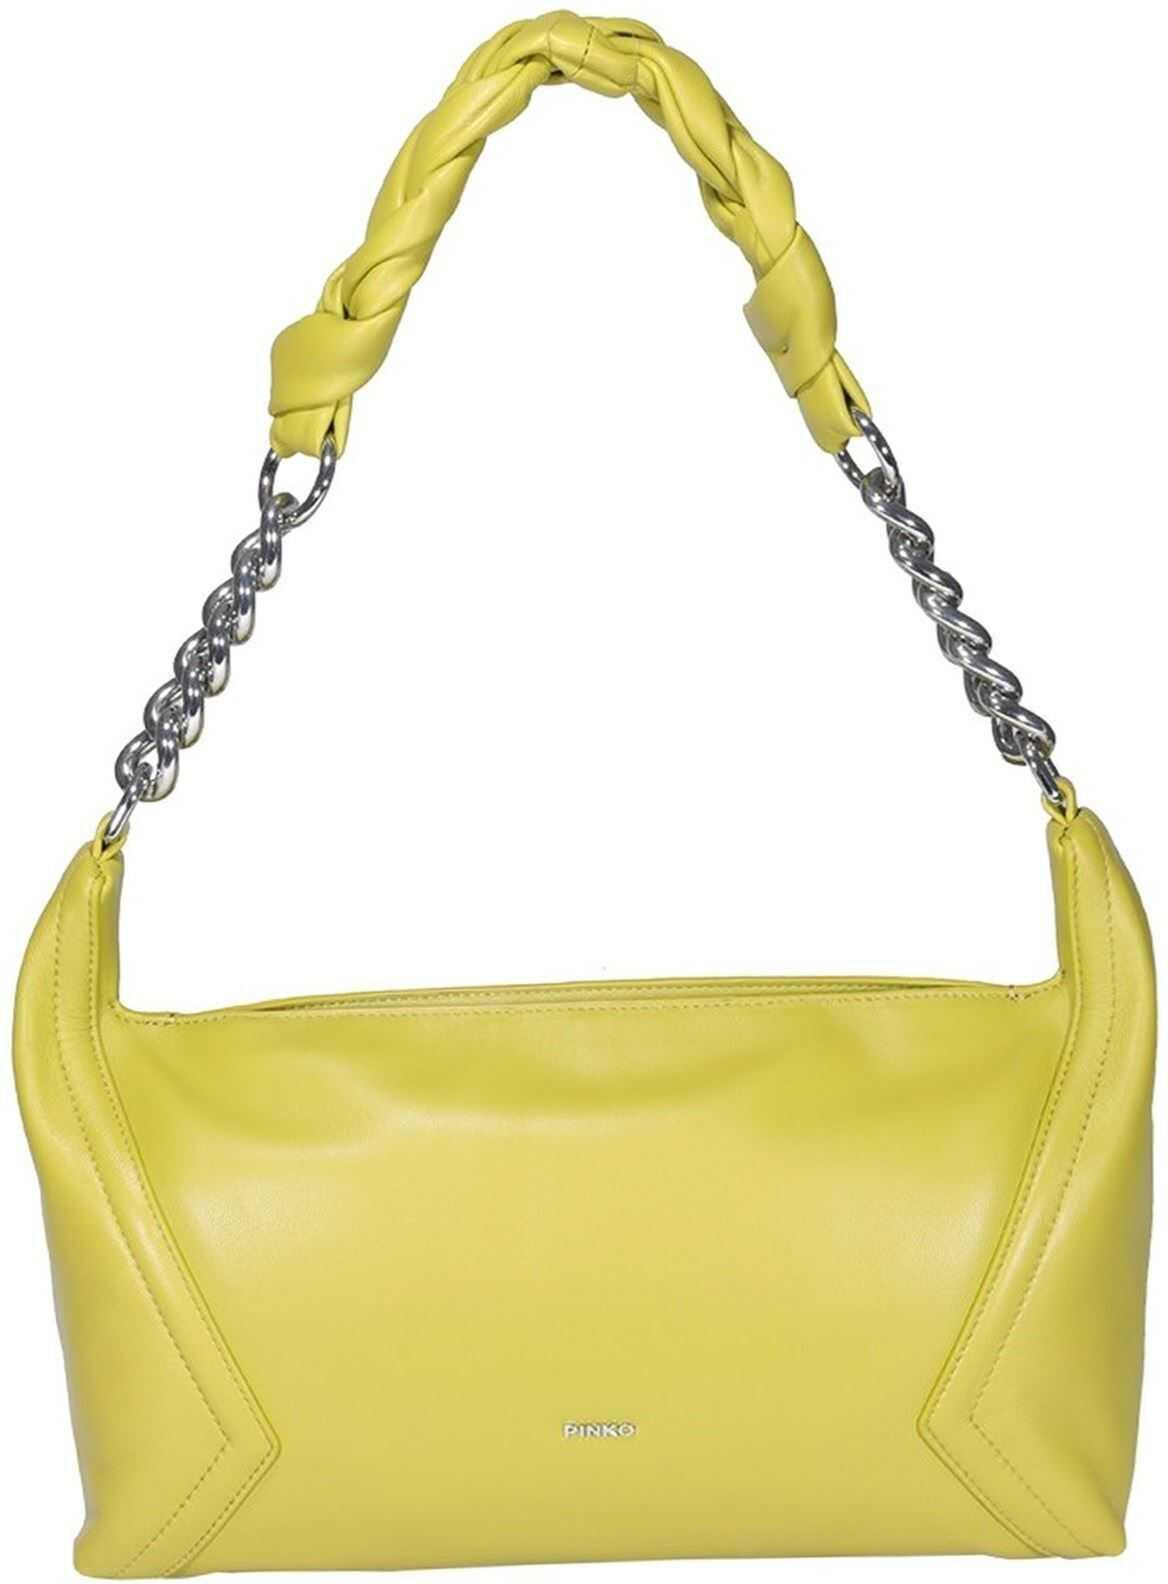 Pinko Medium Hobo Bag In Yellow 1P2235Y6Y7T56 Yellow imagine b-mall.ro